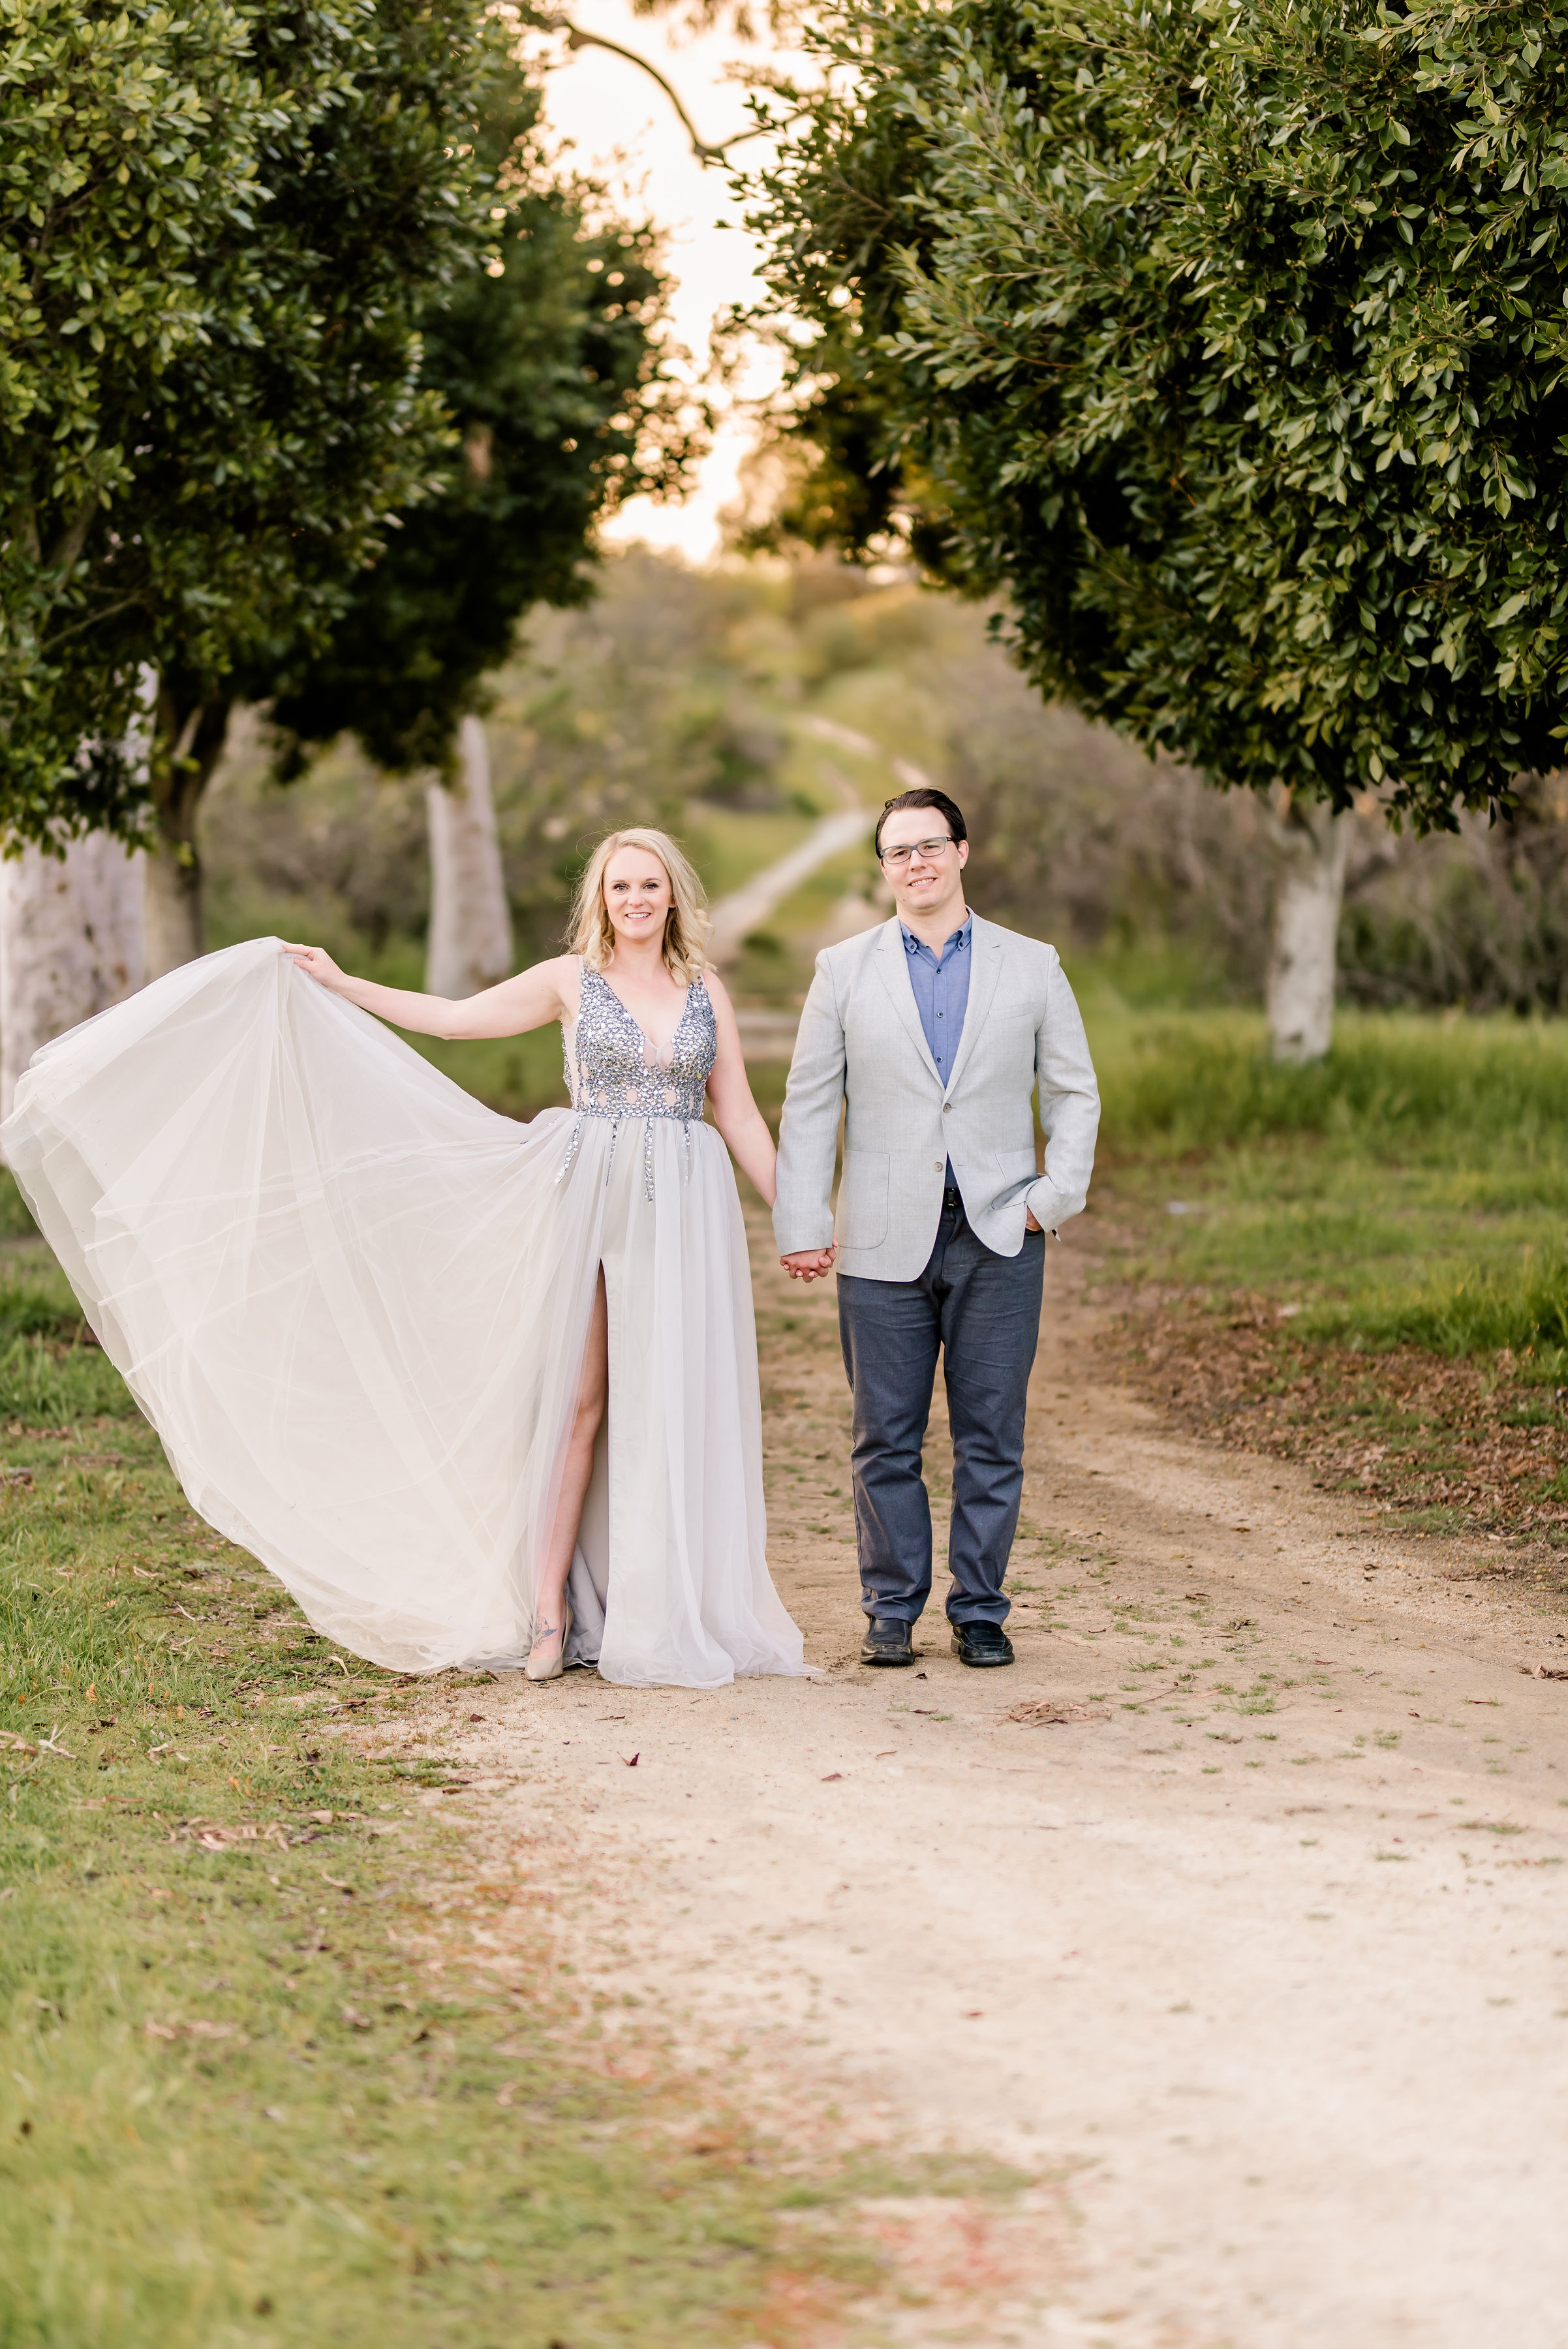 Ann Vestal Wedding and Elopement Photographer North Carolina